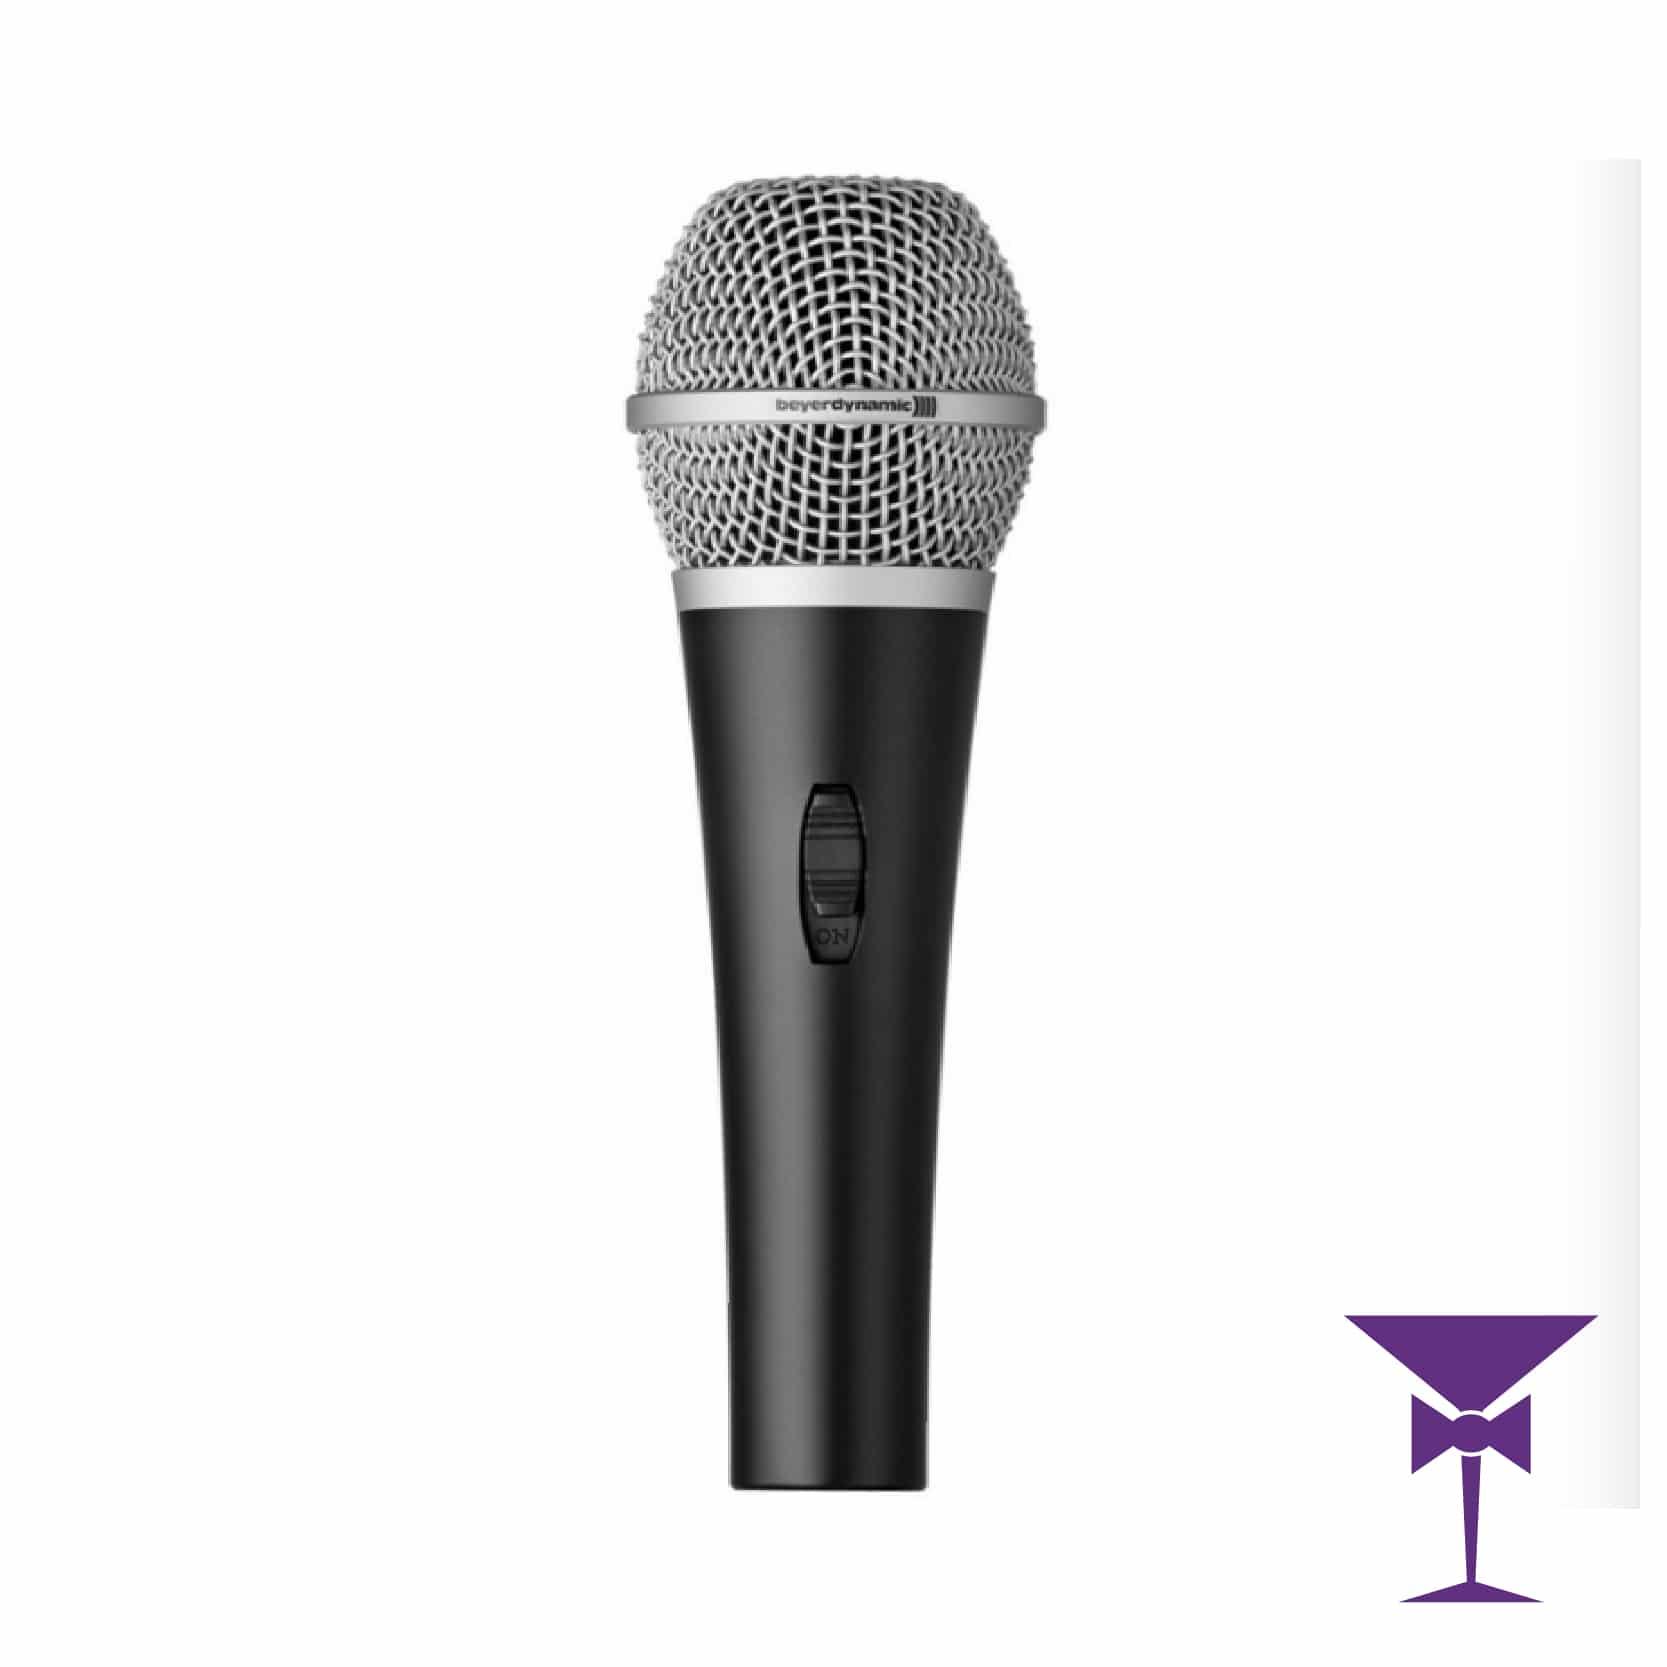 Beyerdynamic TGV 35 Wired Microphone Hire